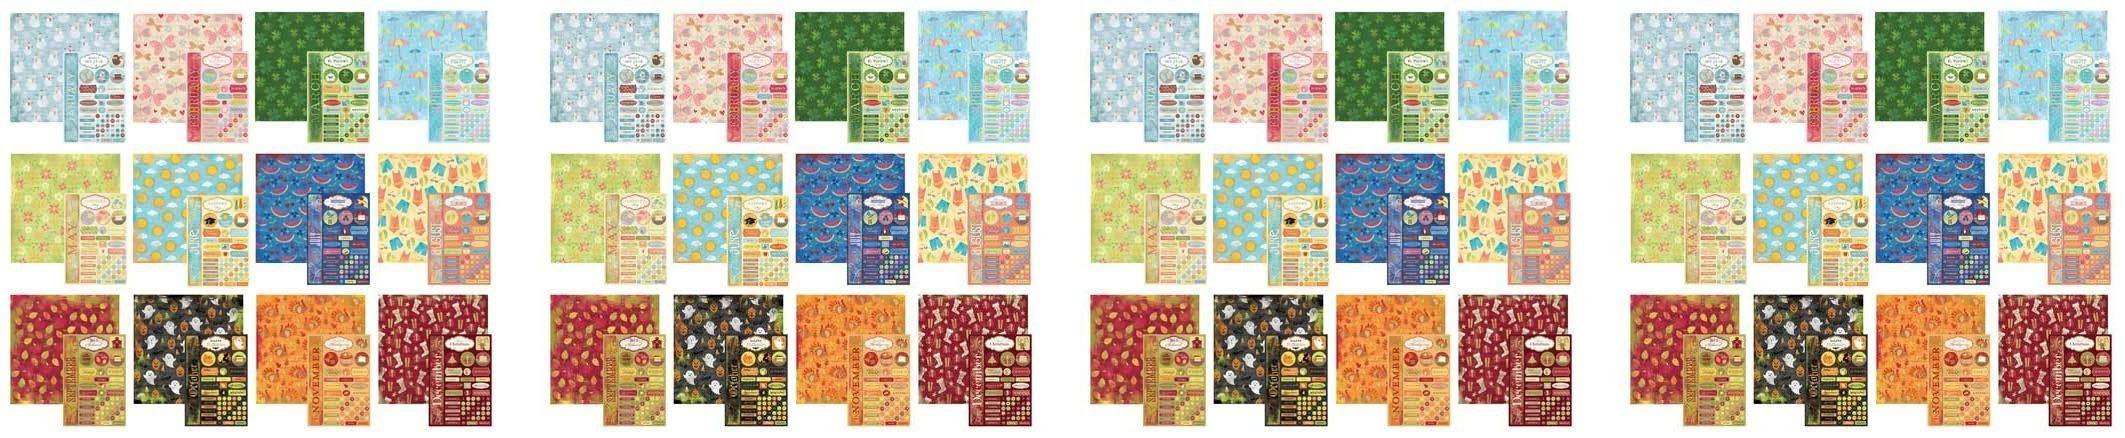 Karen Foster Design Scrapbook Calendar Creations Creative Kit (4-(Pack))